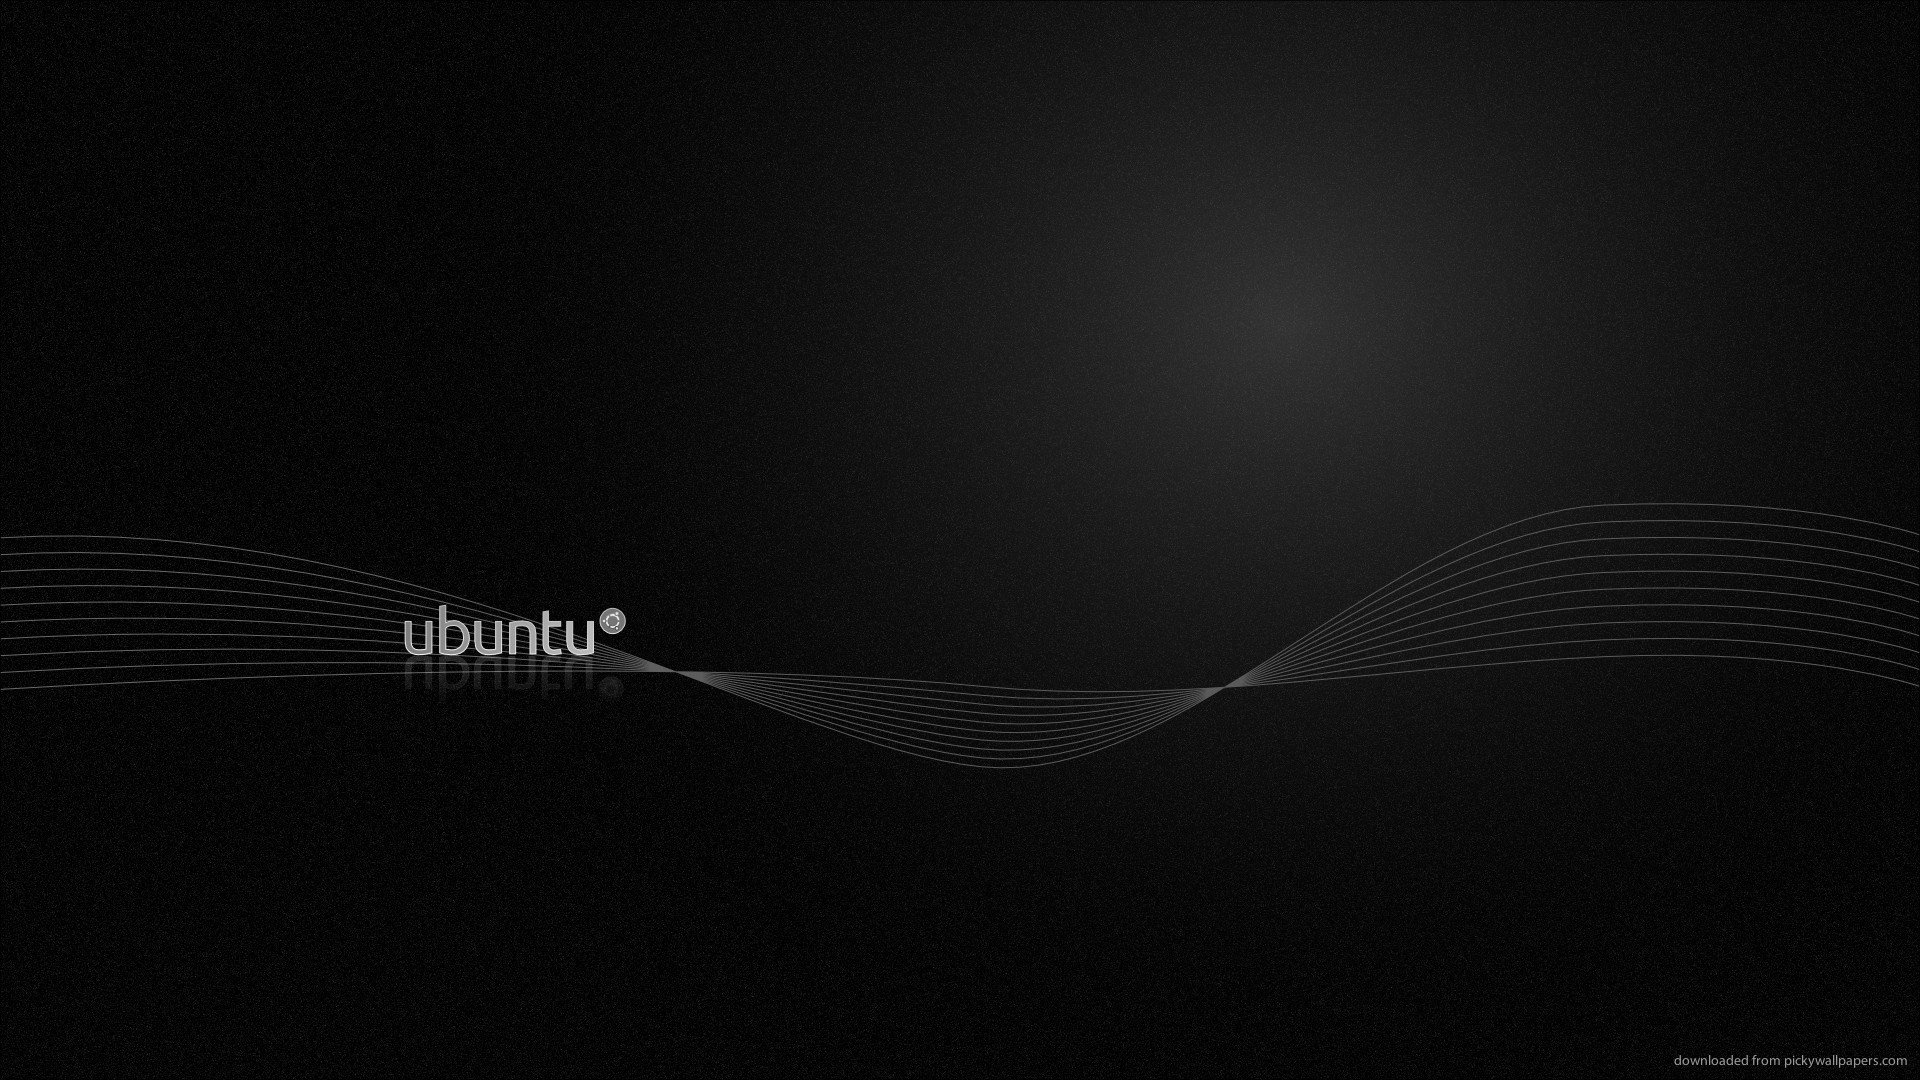 HD Ubuntu Black Wallpaper 1920x1080